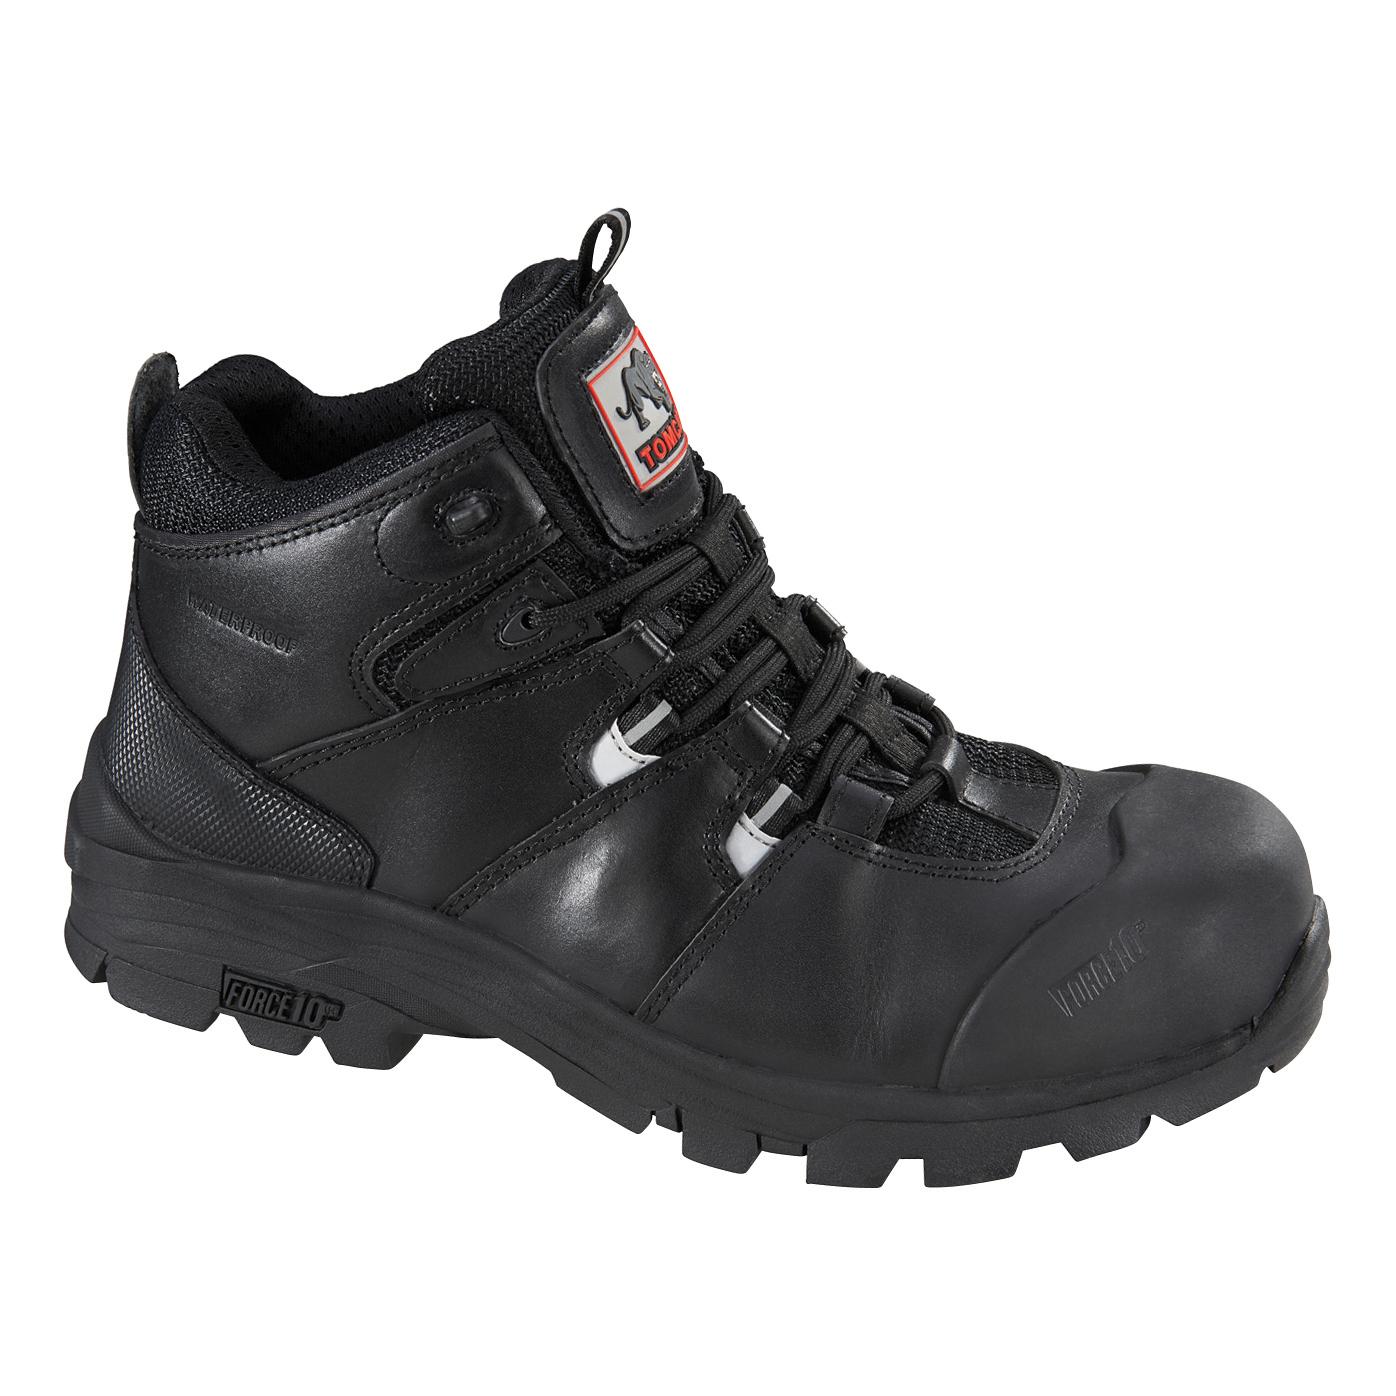 Footwear Rockfall Peakmoor Hiker 100% Non-Metallic Fibreglass Toecap Size 7 Blk Ref TC4200-7 *5-7 Day Leadtime*